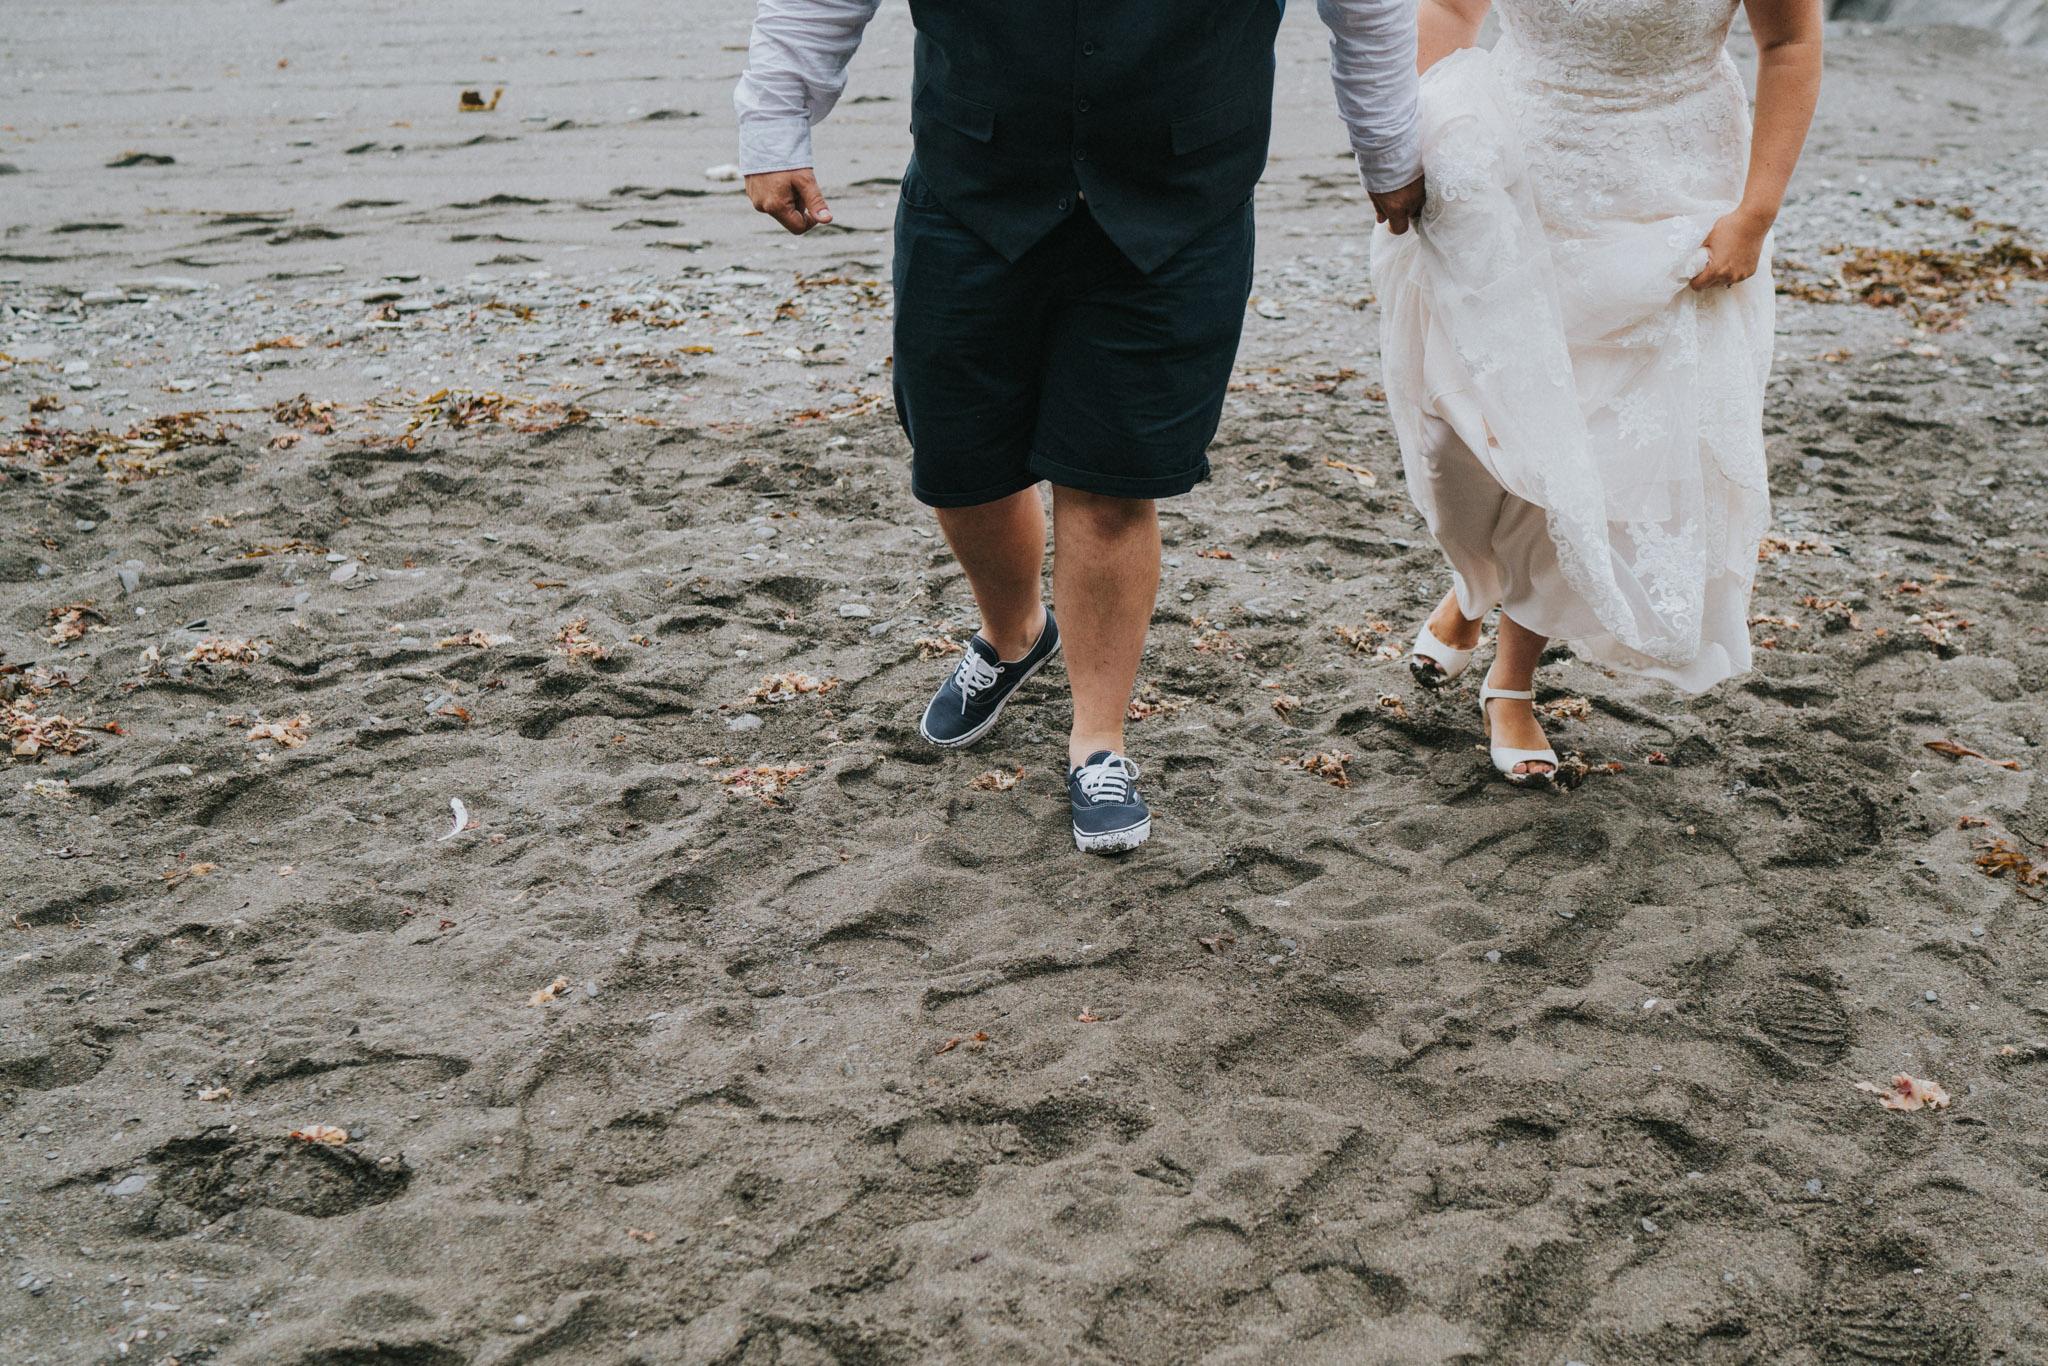 John-Amy-Tunnels-Beaches-Ilfracombe-Devon-Outdoor-Wedding-UK-Colchester-Essex-Alternative-Wedding-Photographer-Grace-Elizabeth (28 of 31).jpg